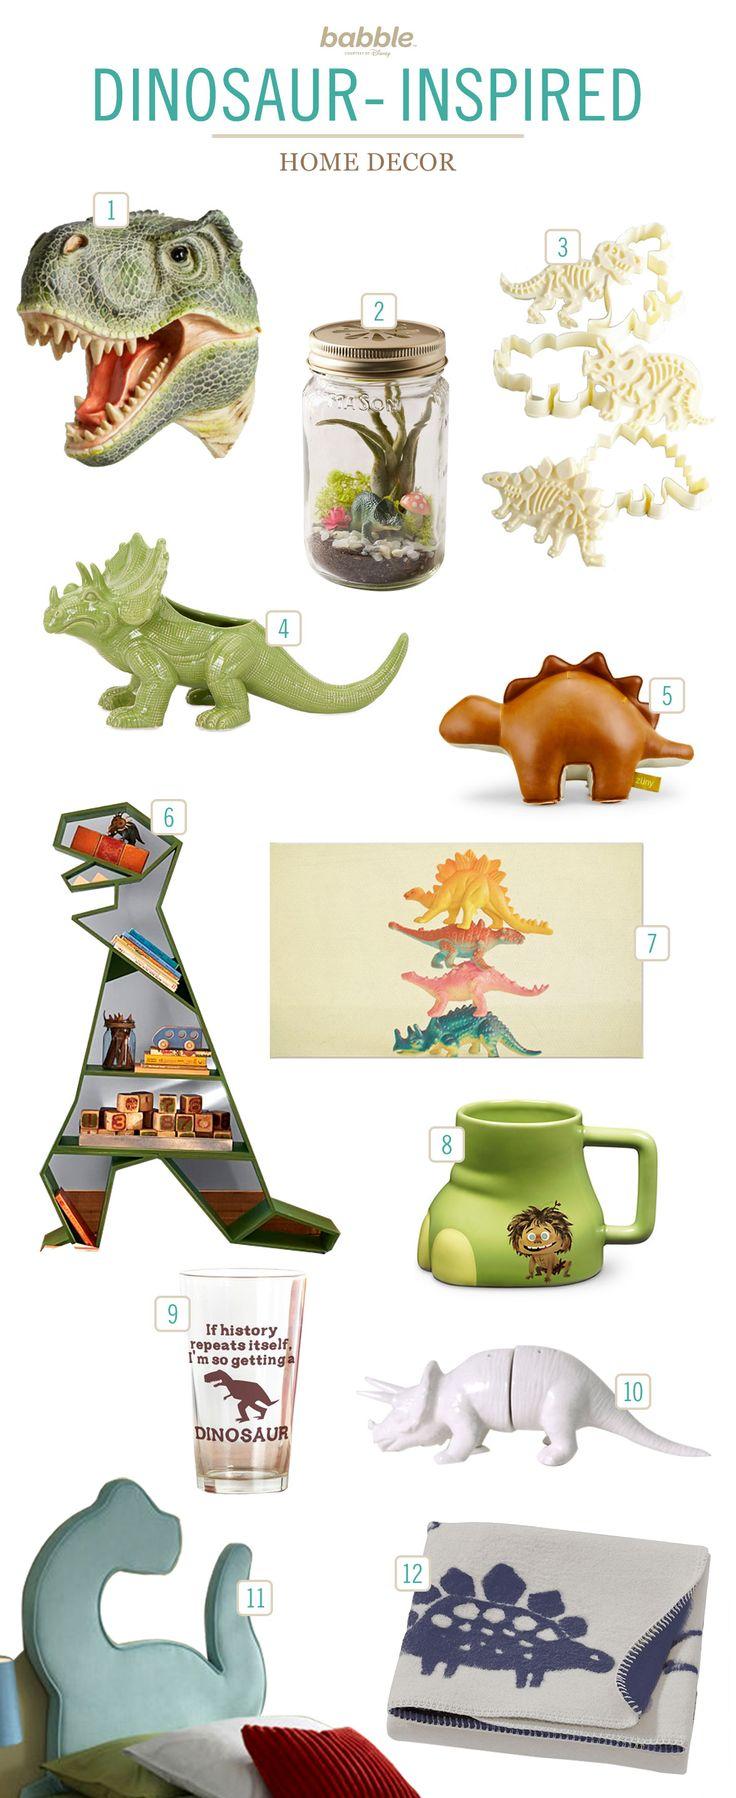 29 best the good dinosaur images on pinterest the good dinosaur